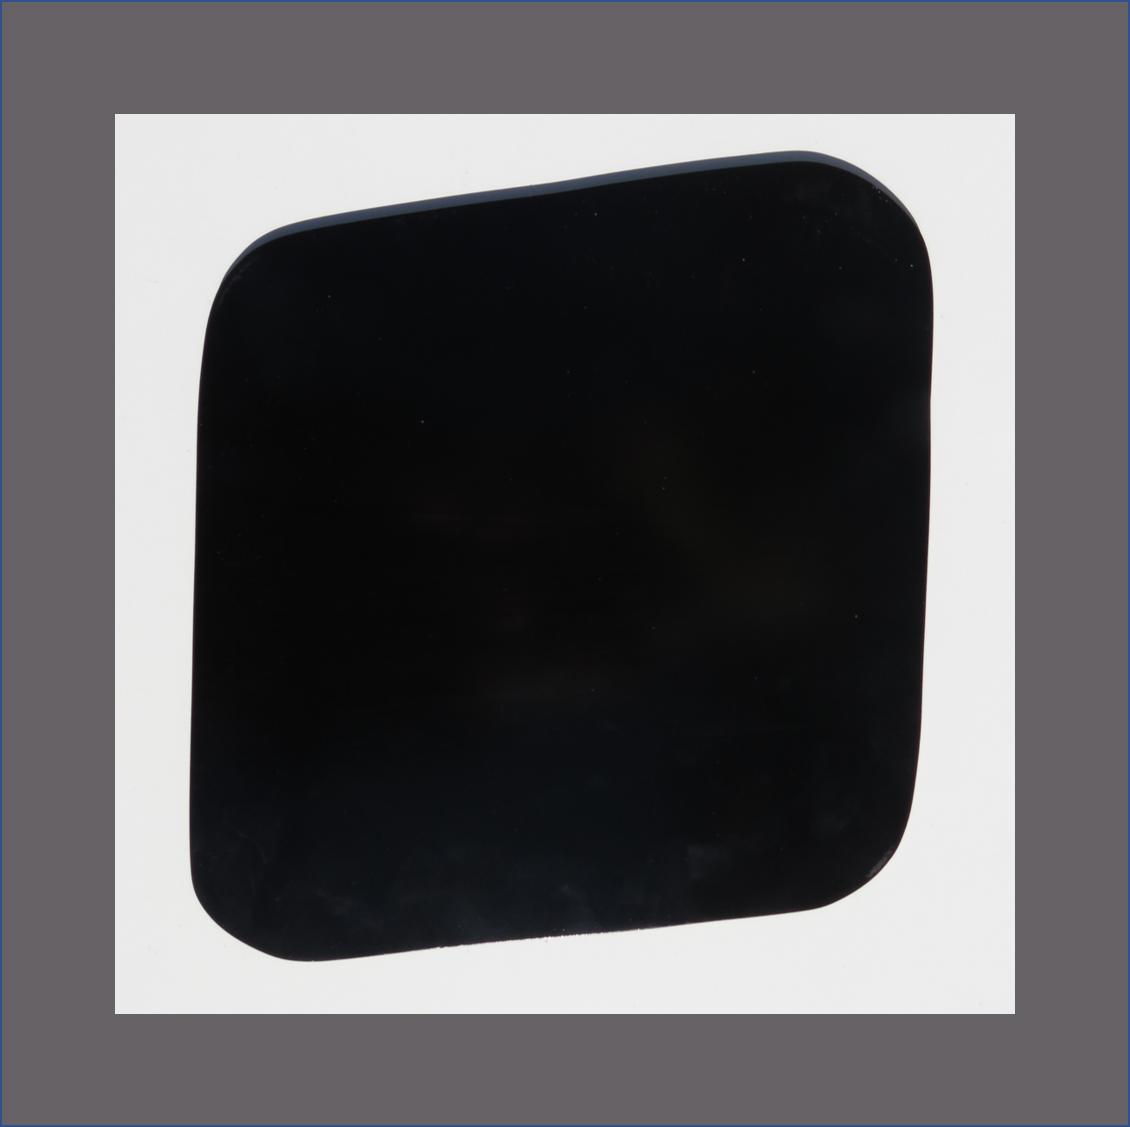 black-diamond-underplate